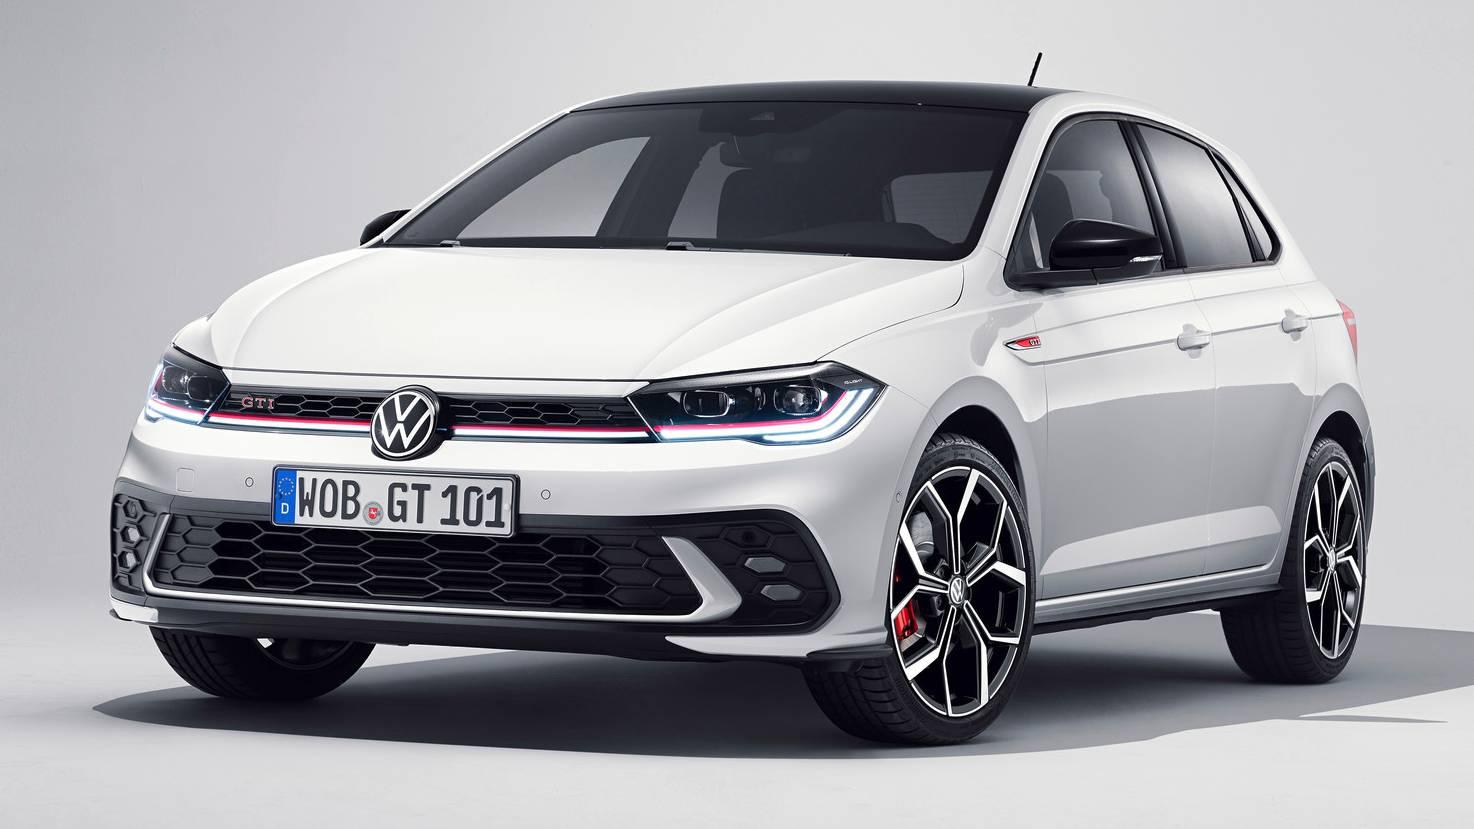 'IQ Light' matrix LED headlights now standard on the Volkswagen Polo GTI. Image: Volkswagen